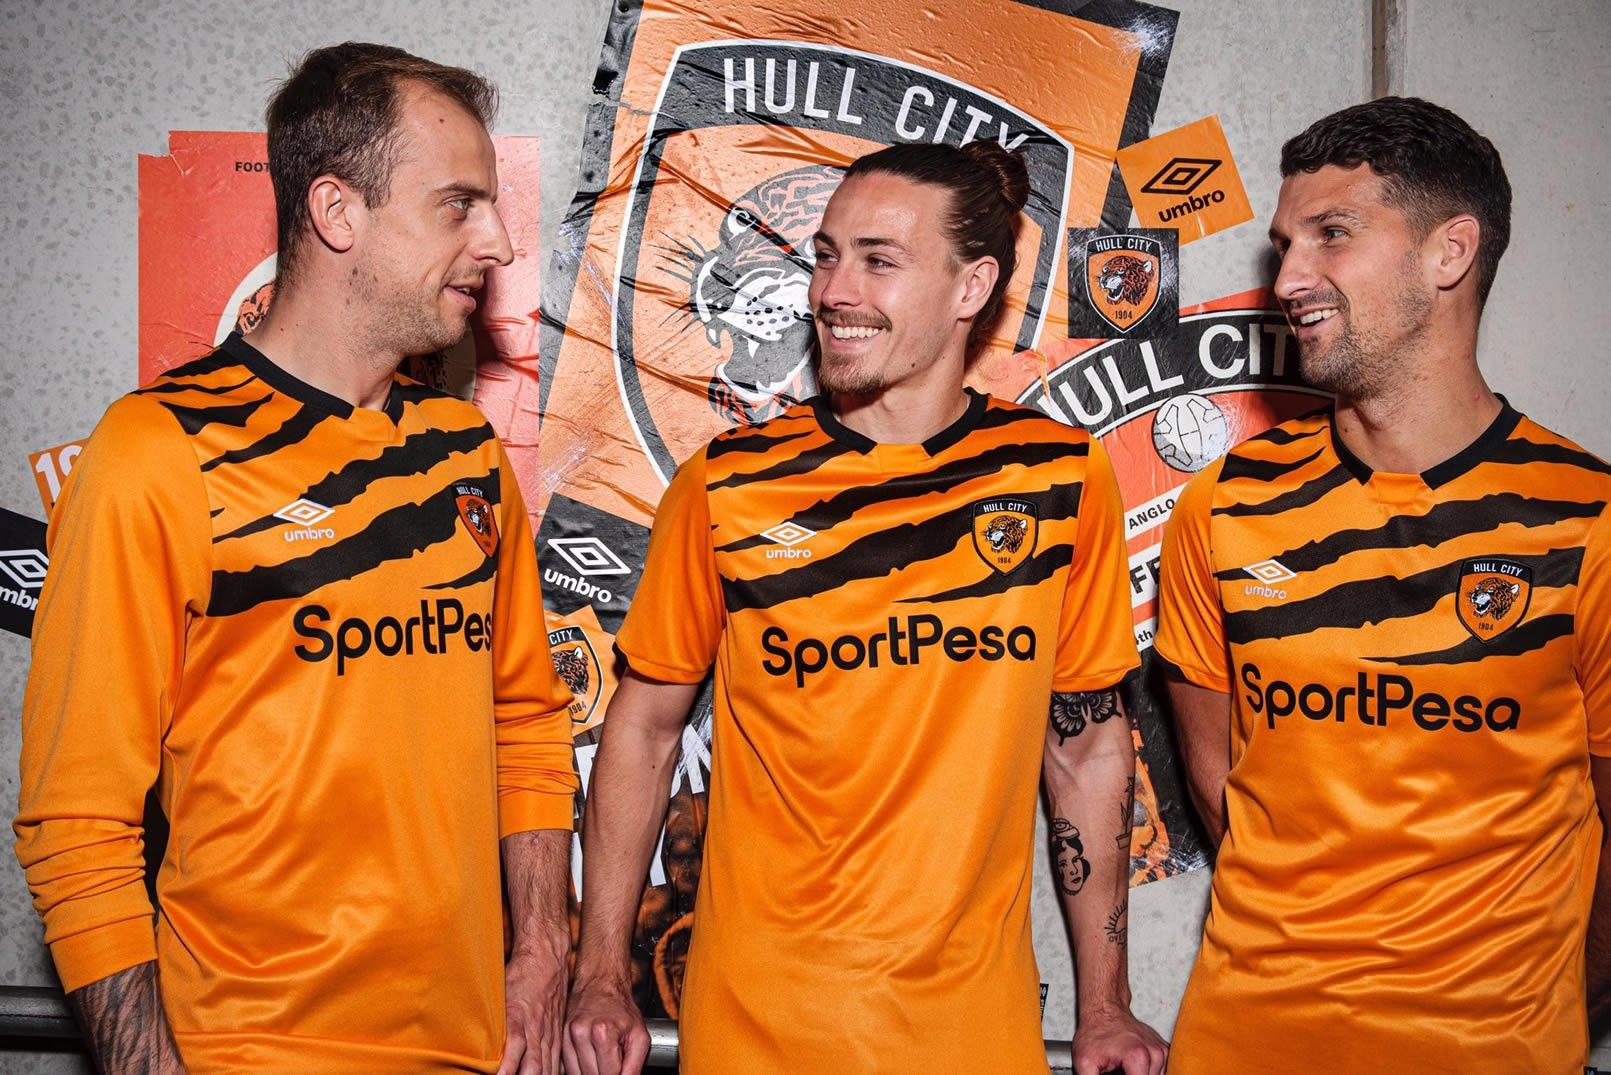 Camiseta Umbro del Hull City 2019/20 | Imagen Web Oficial